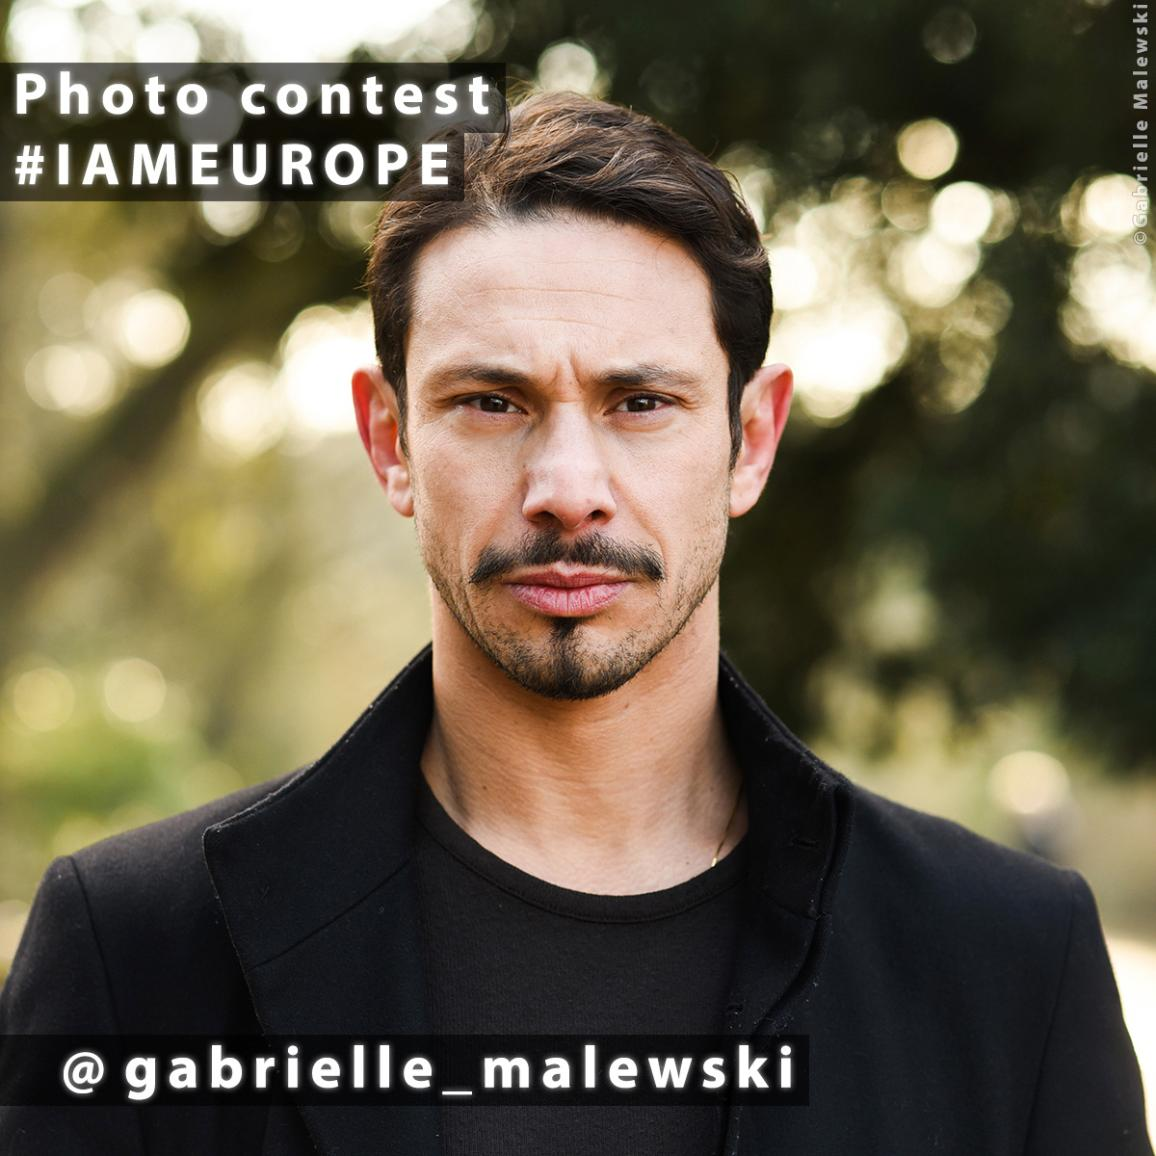 Foto: Muchas gracias al fotógrafo francés, Gabrielle Malewski (instagram @gabrielle_malewski)  por dar su testimonio en el concurso.